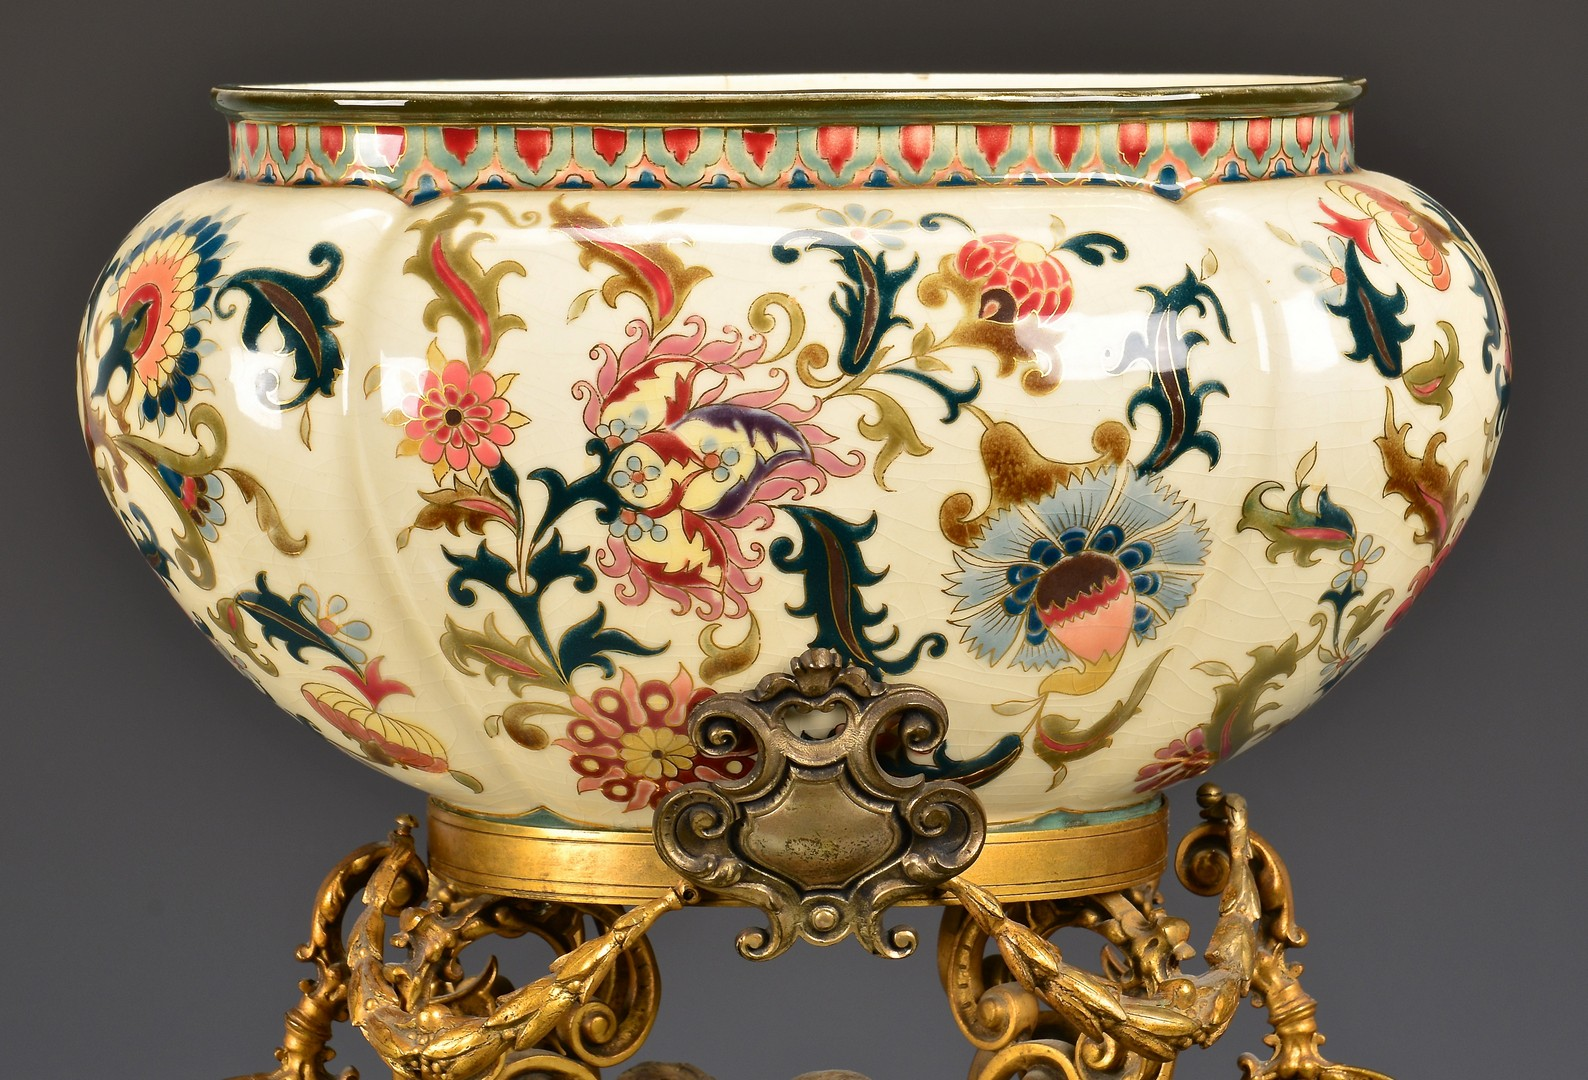 Lot 715: Zsolnay Ceramic & Gilt Centerpiece